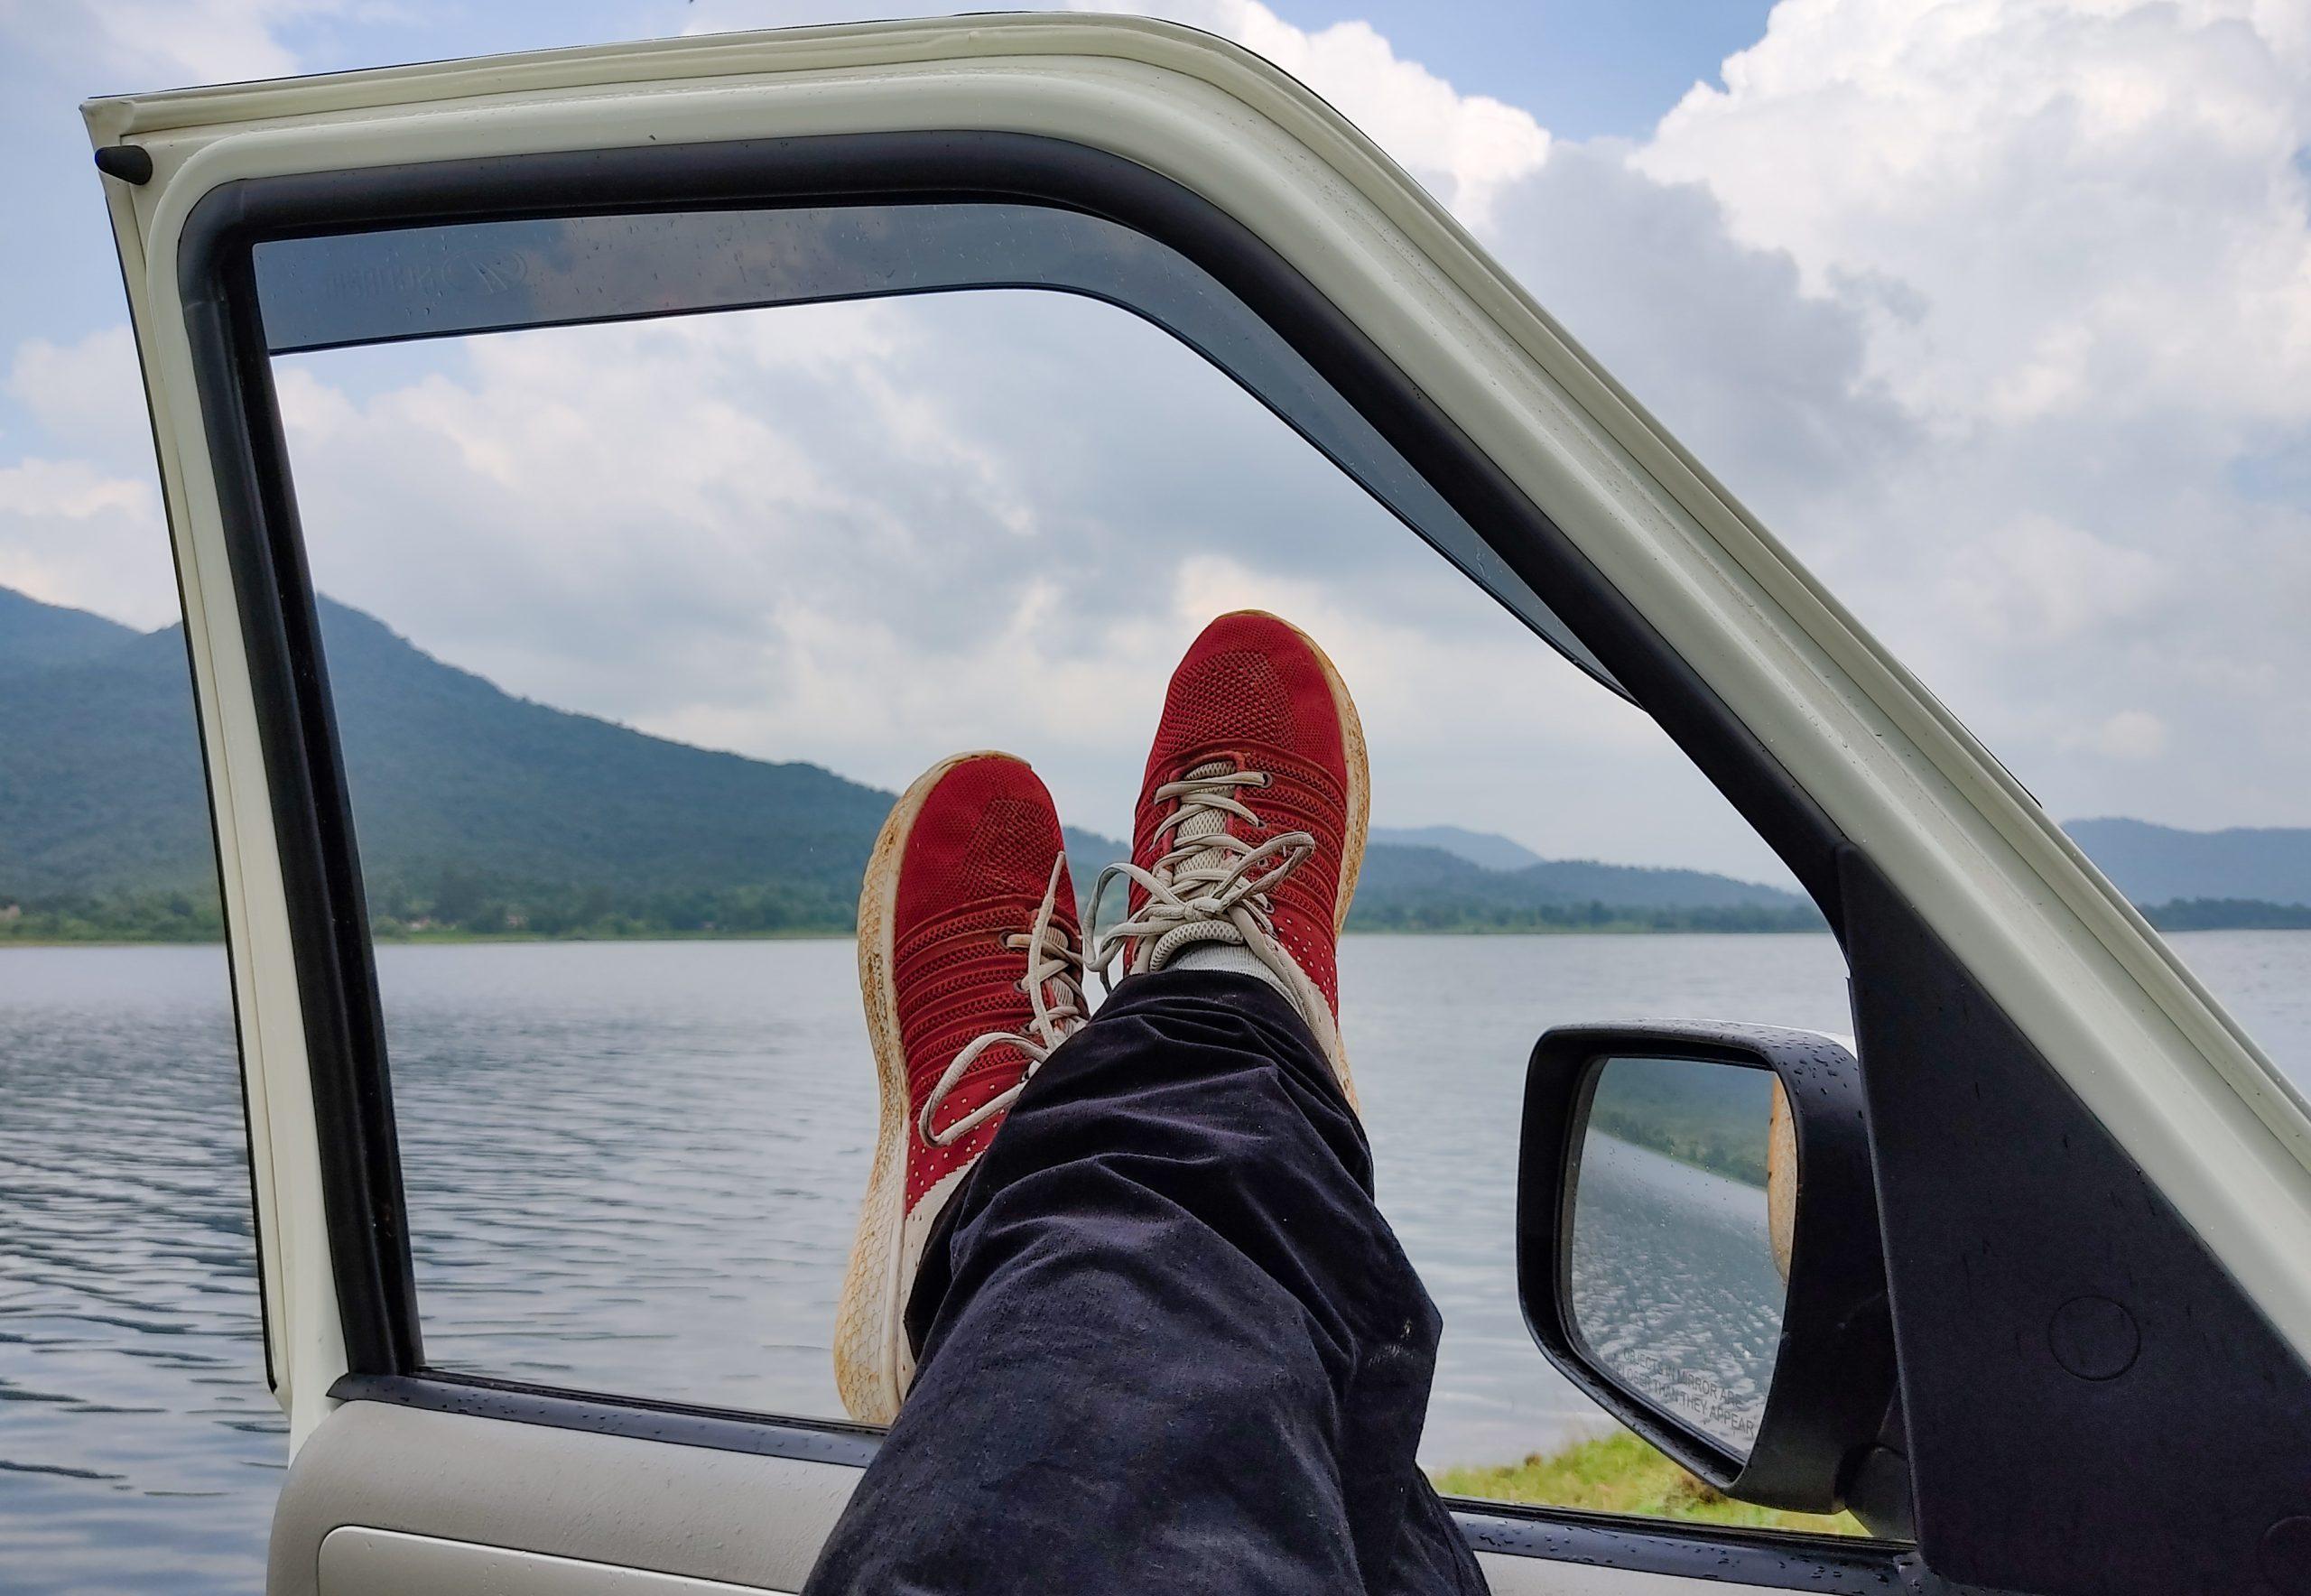 Relaxing near a river